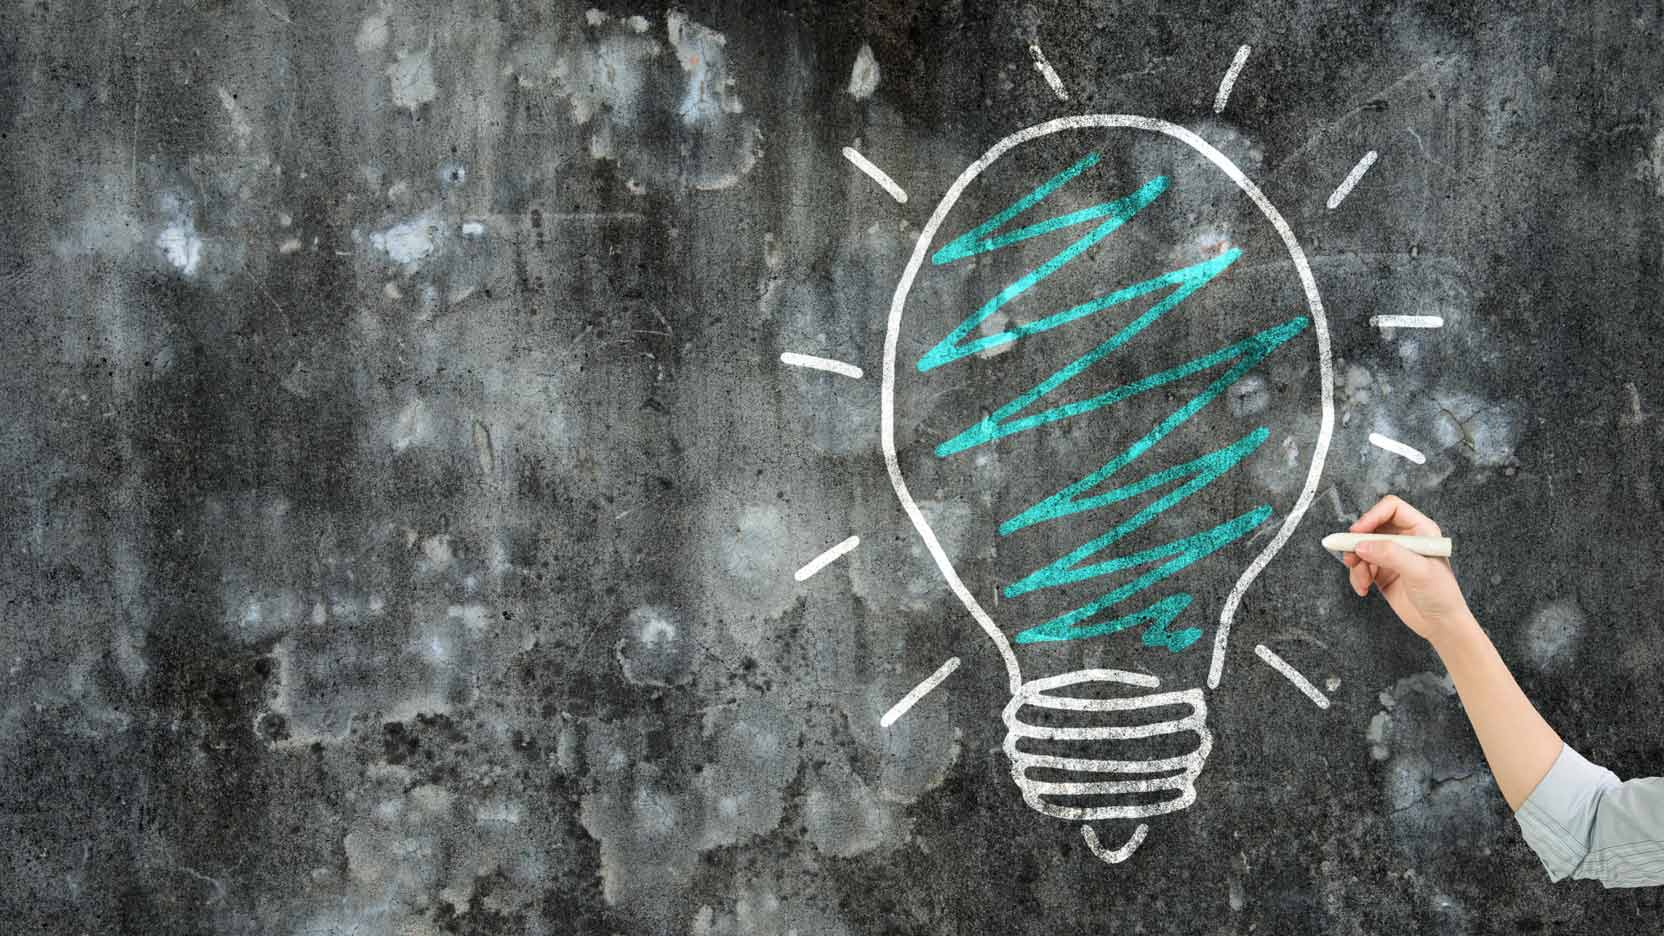 Eureka: GA innovation's box of ideas